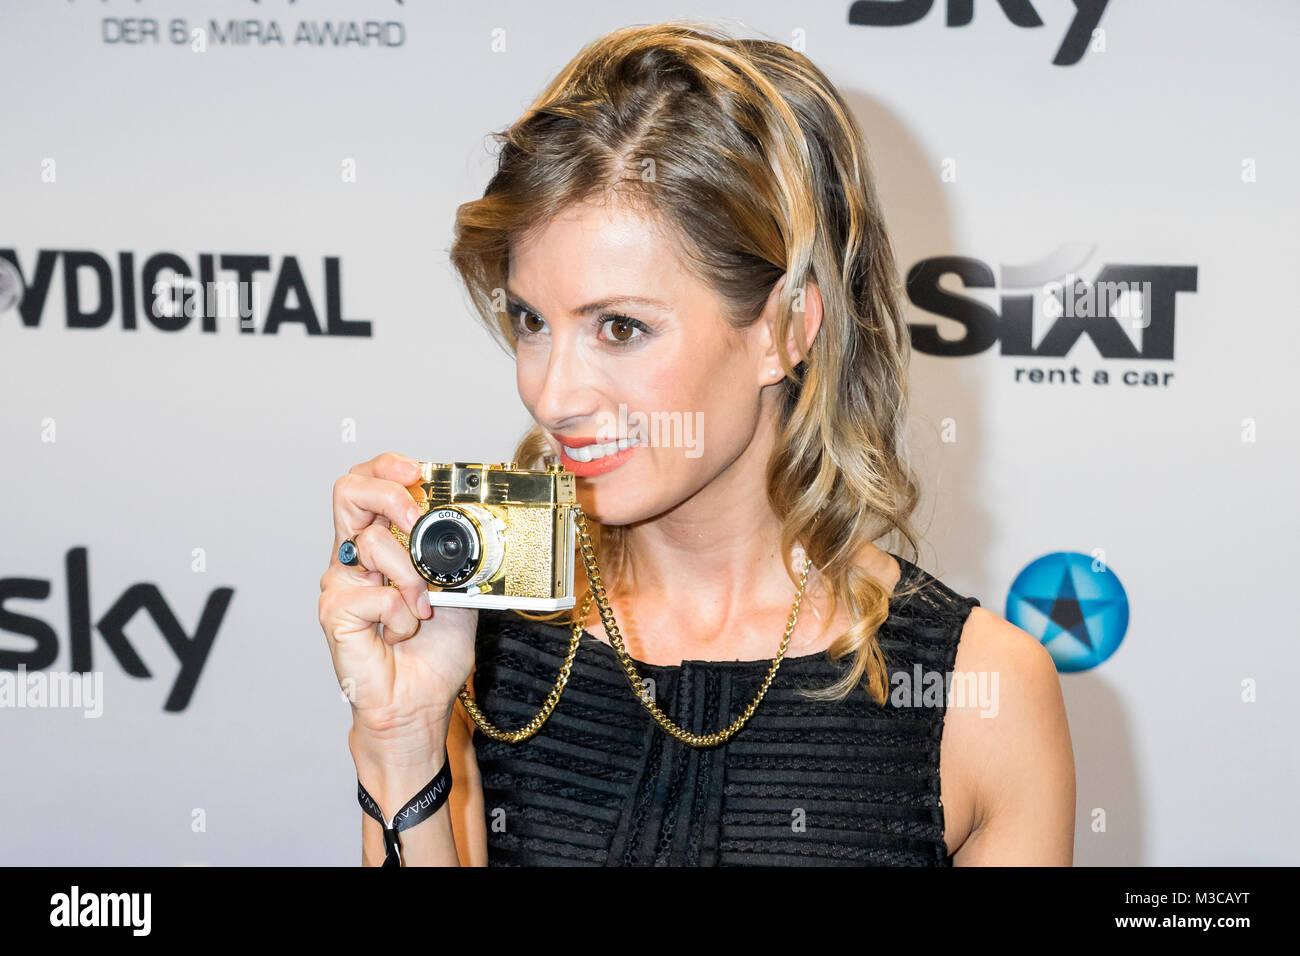 6 Mira Award Stockfotos 6 Mira Award Bilder Seite 2 Alamy